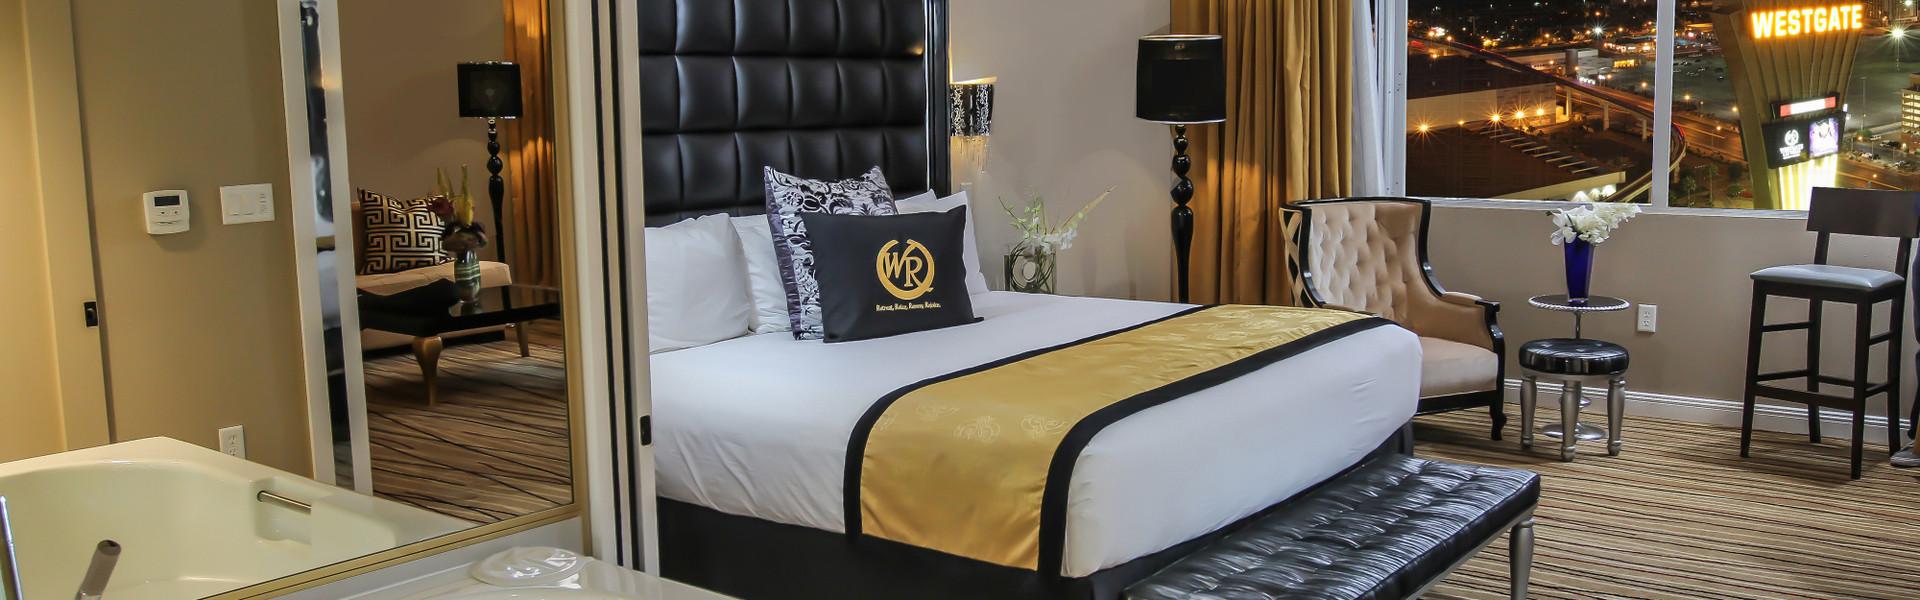 Our Las Vegas Hotel Suites And Villas | Westgate Las Vegas Resort & Casino | Westgate Resorts